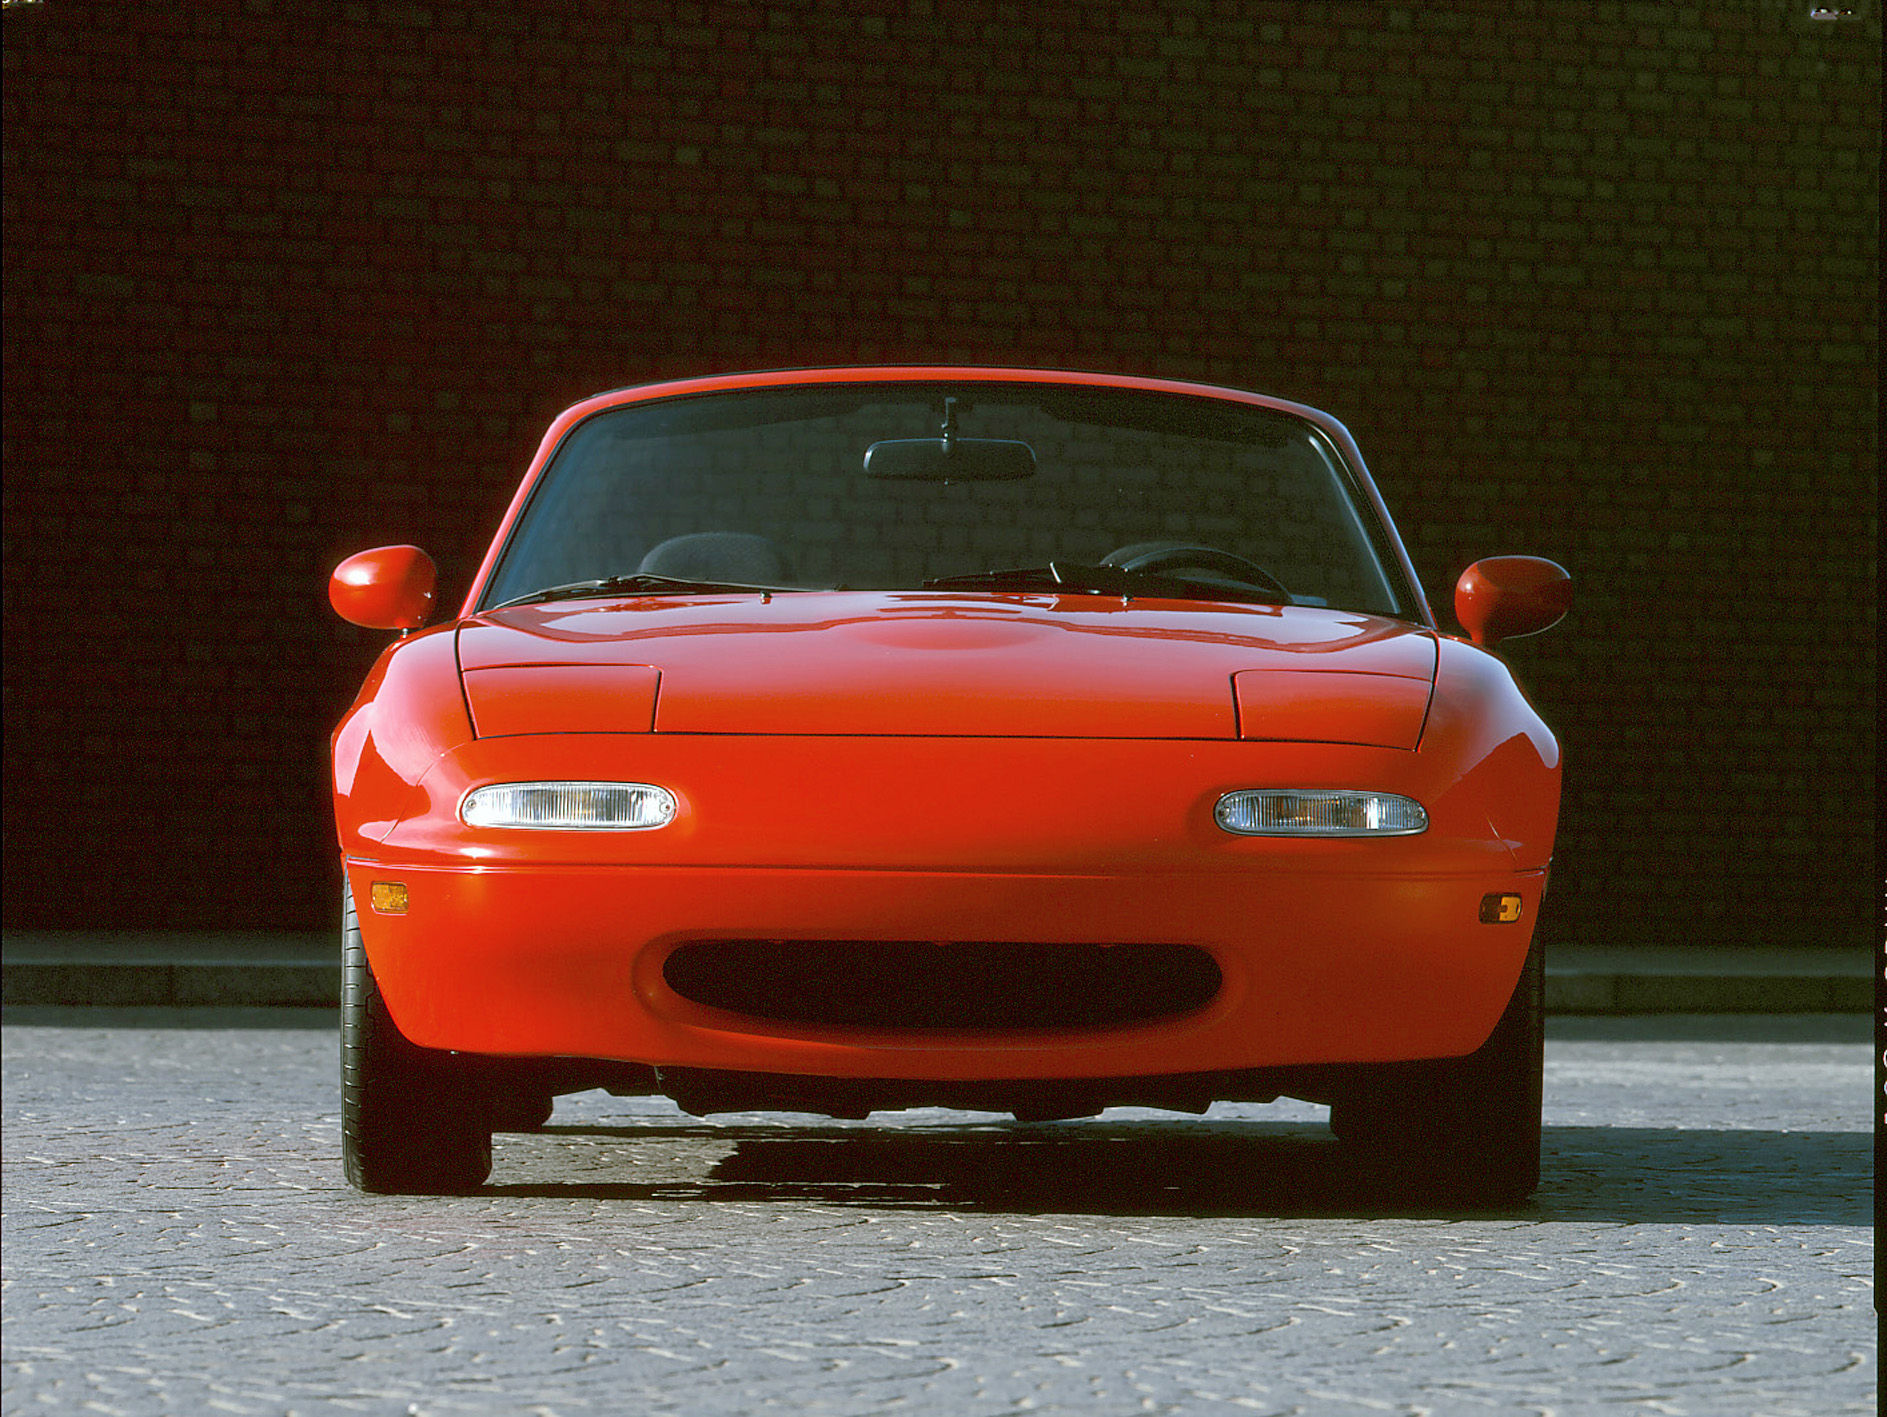 1990 mazda mx5 miata red front